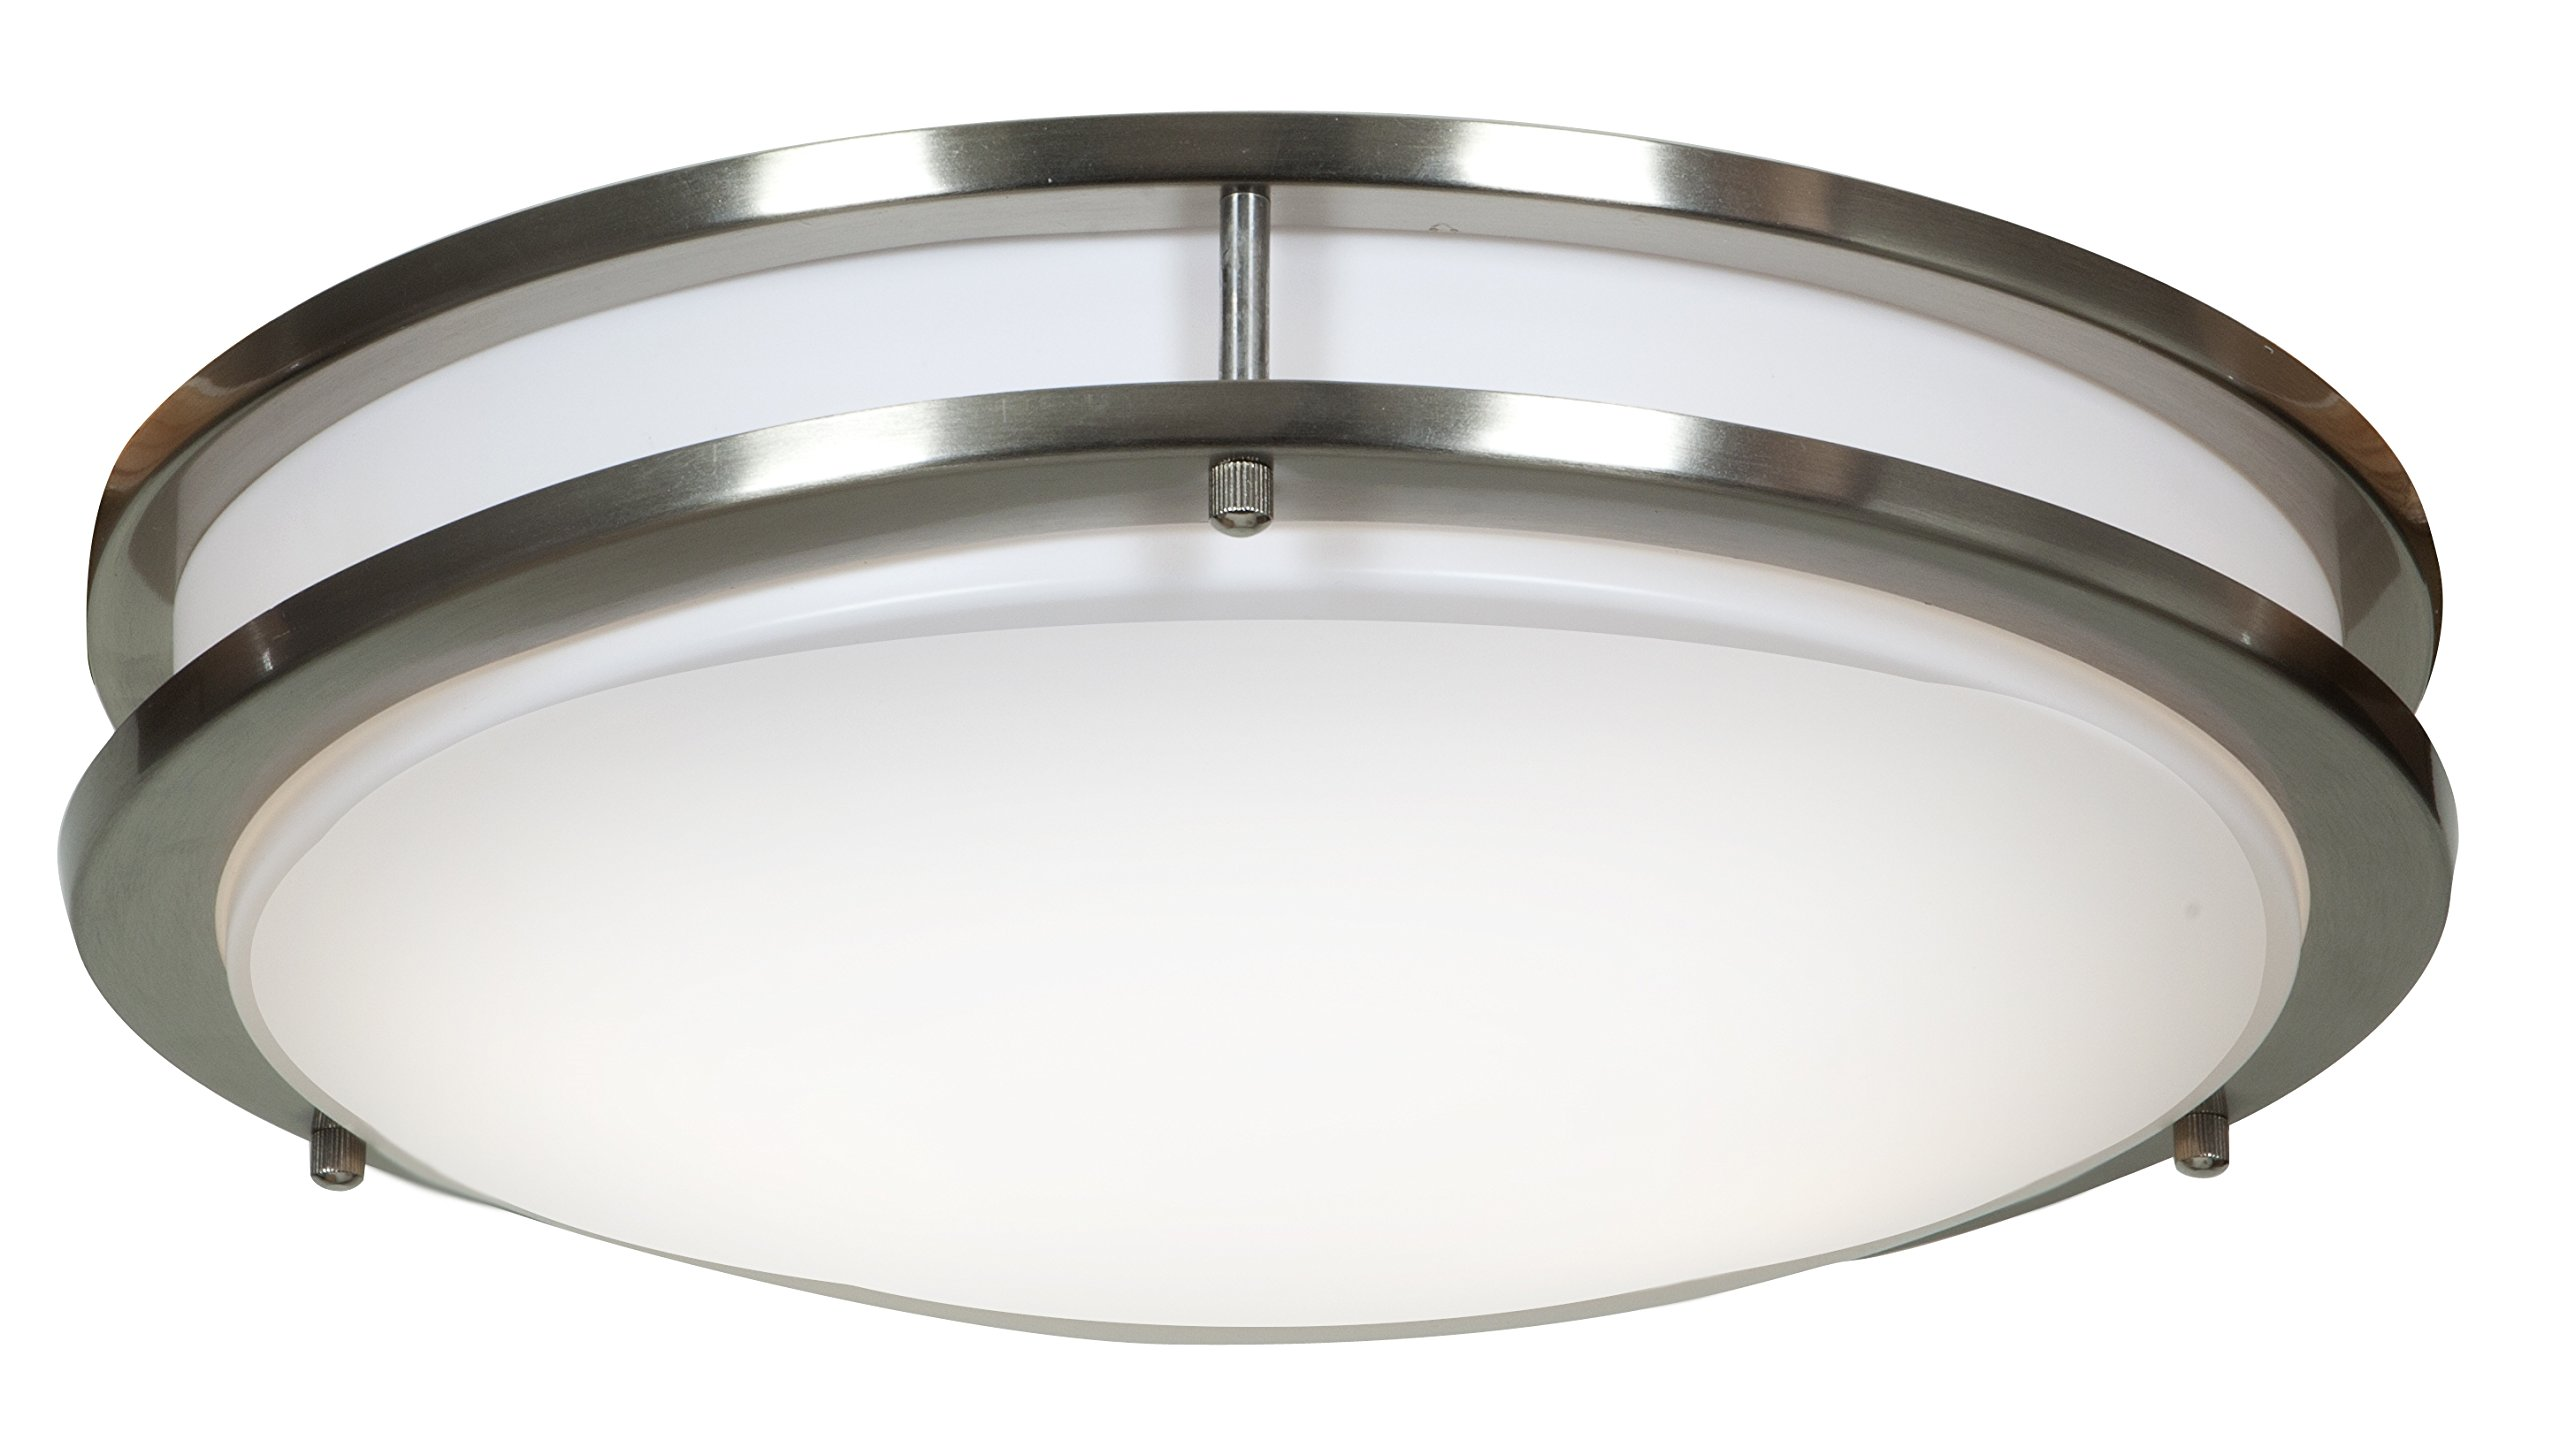 Solero Flush Mount - LED - 14''D - Brushed Steel Finish - Acrylic Lens Diffuser